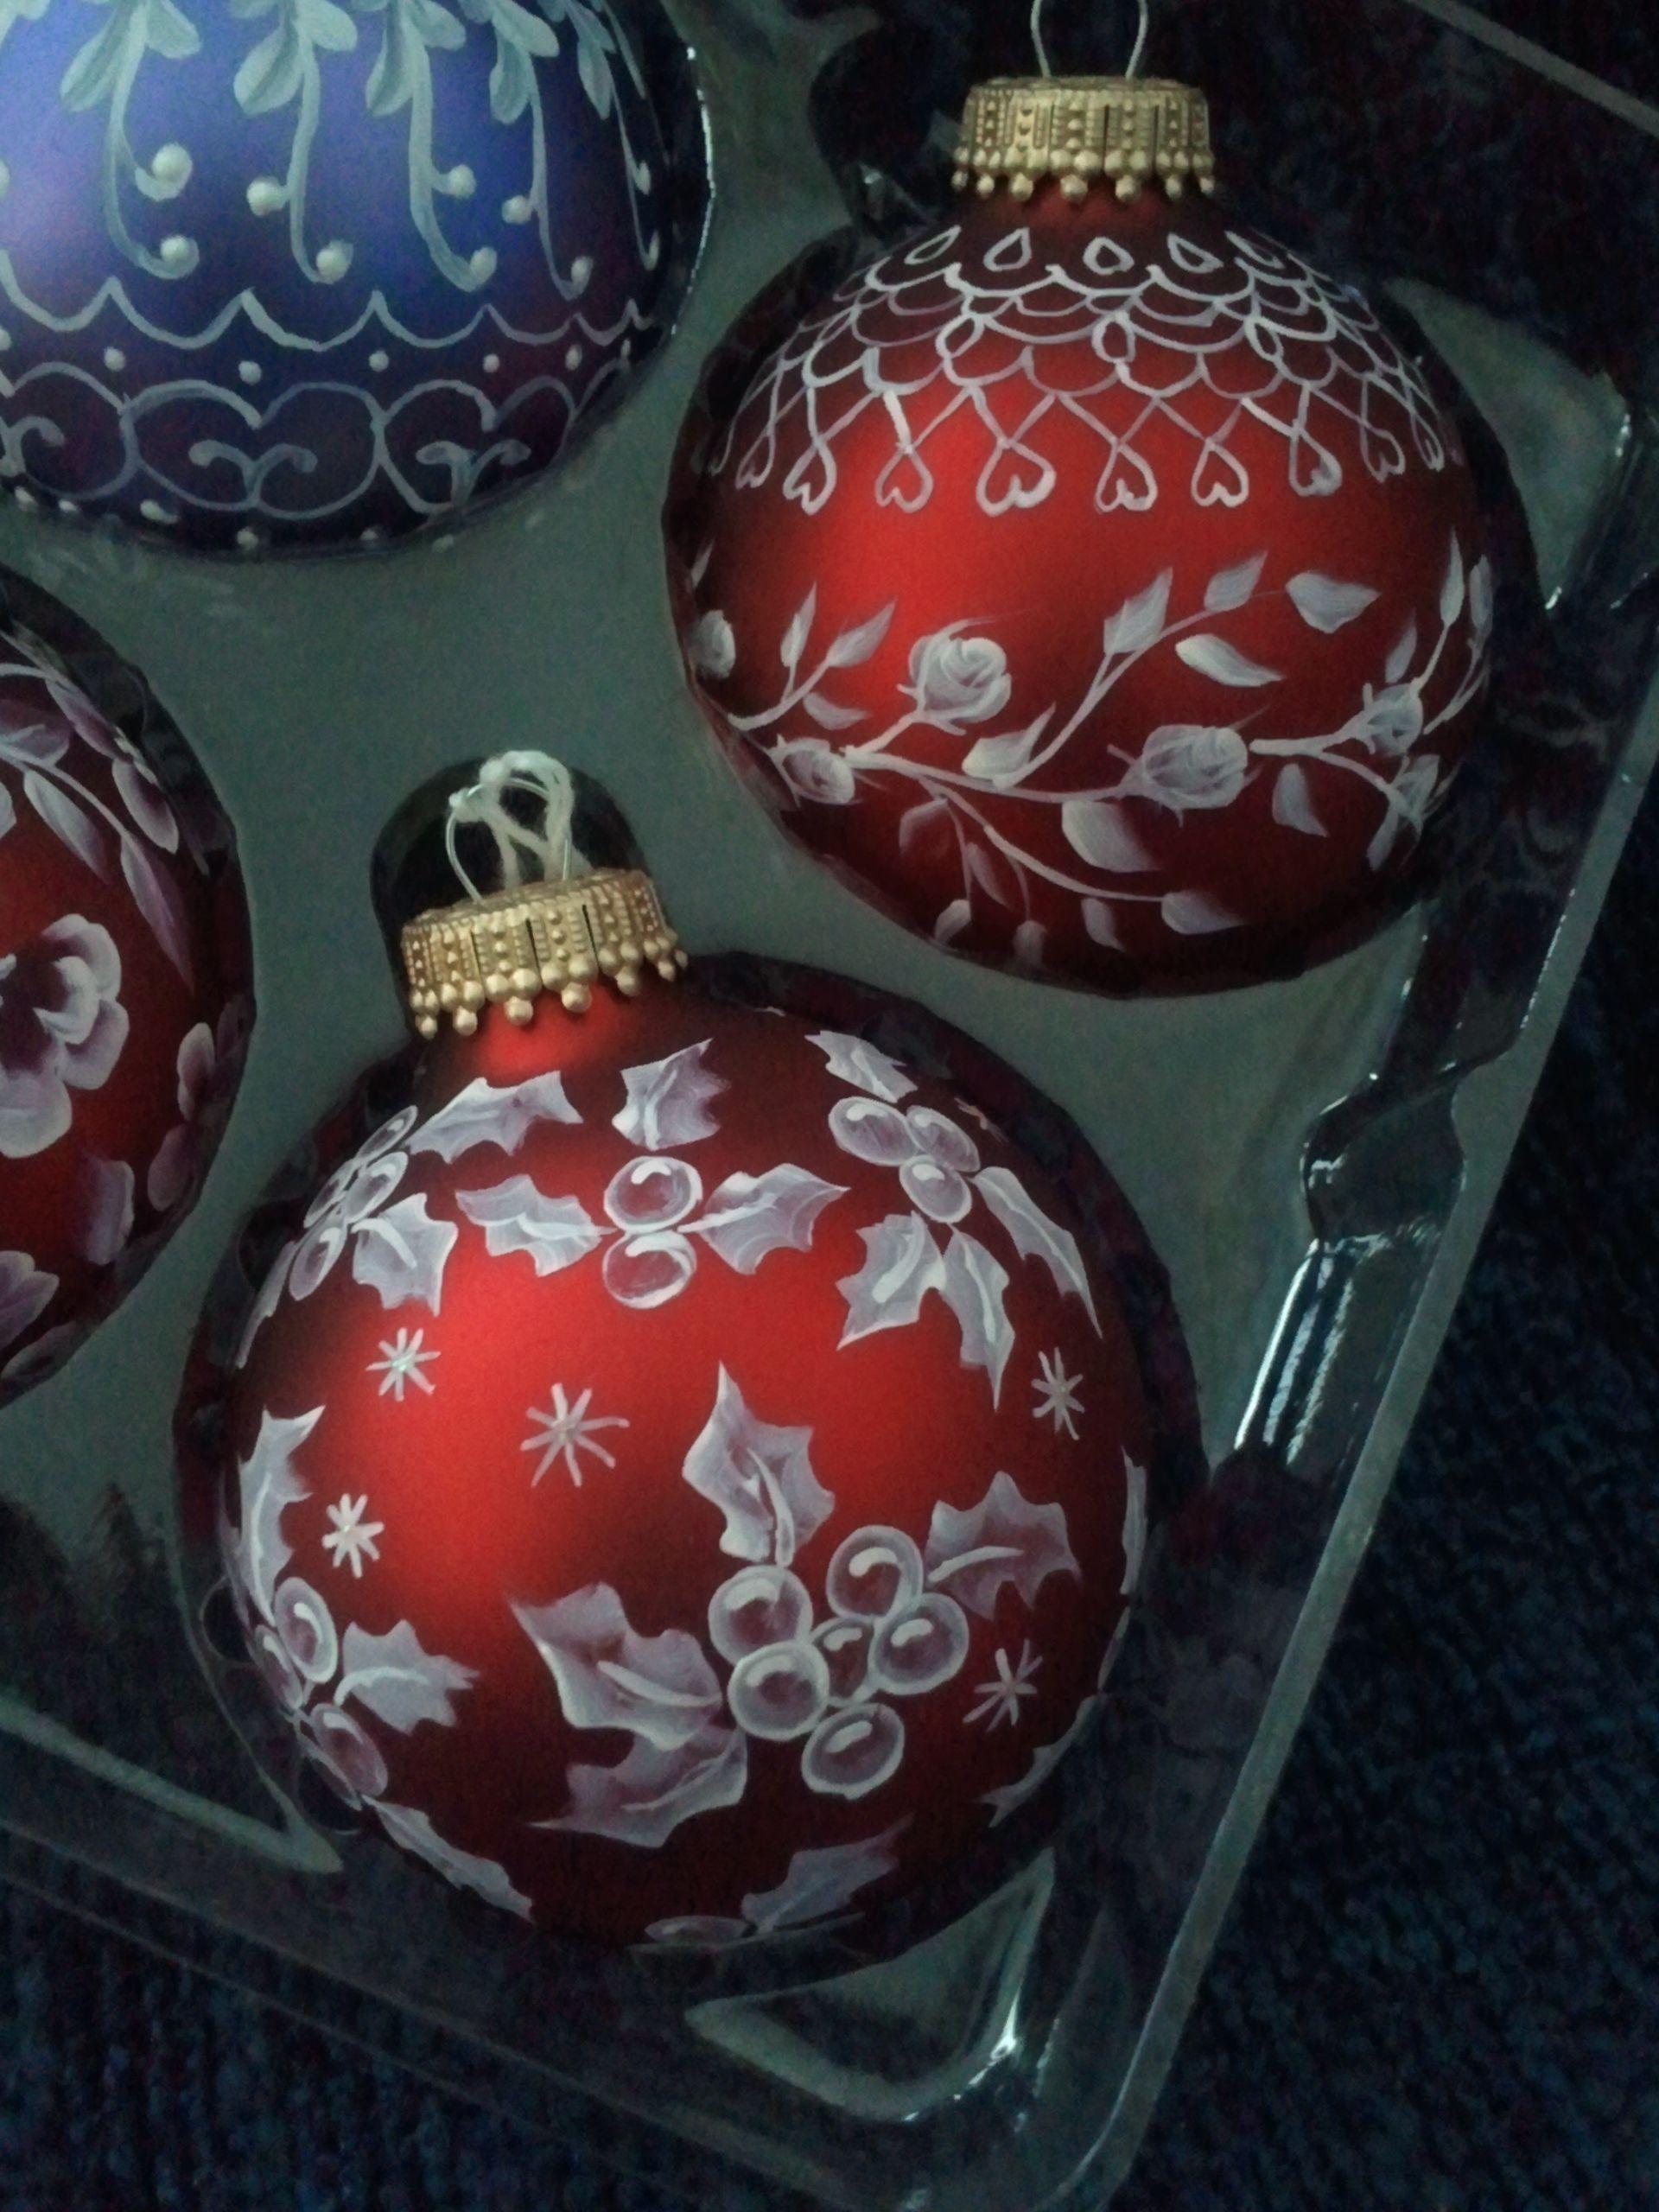 Hand Painted Victorian Look Ornaments Make Great Wedding Gifts Keepsa Handpainted Christmas Ornaments Painted Christmas Ornaments Handmade Christmas Ornaments